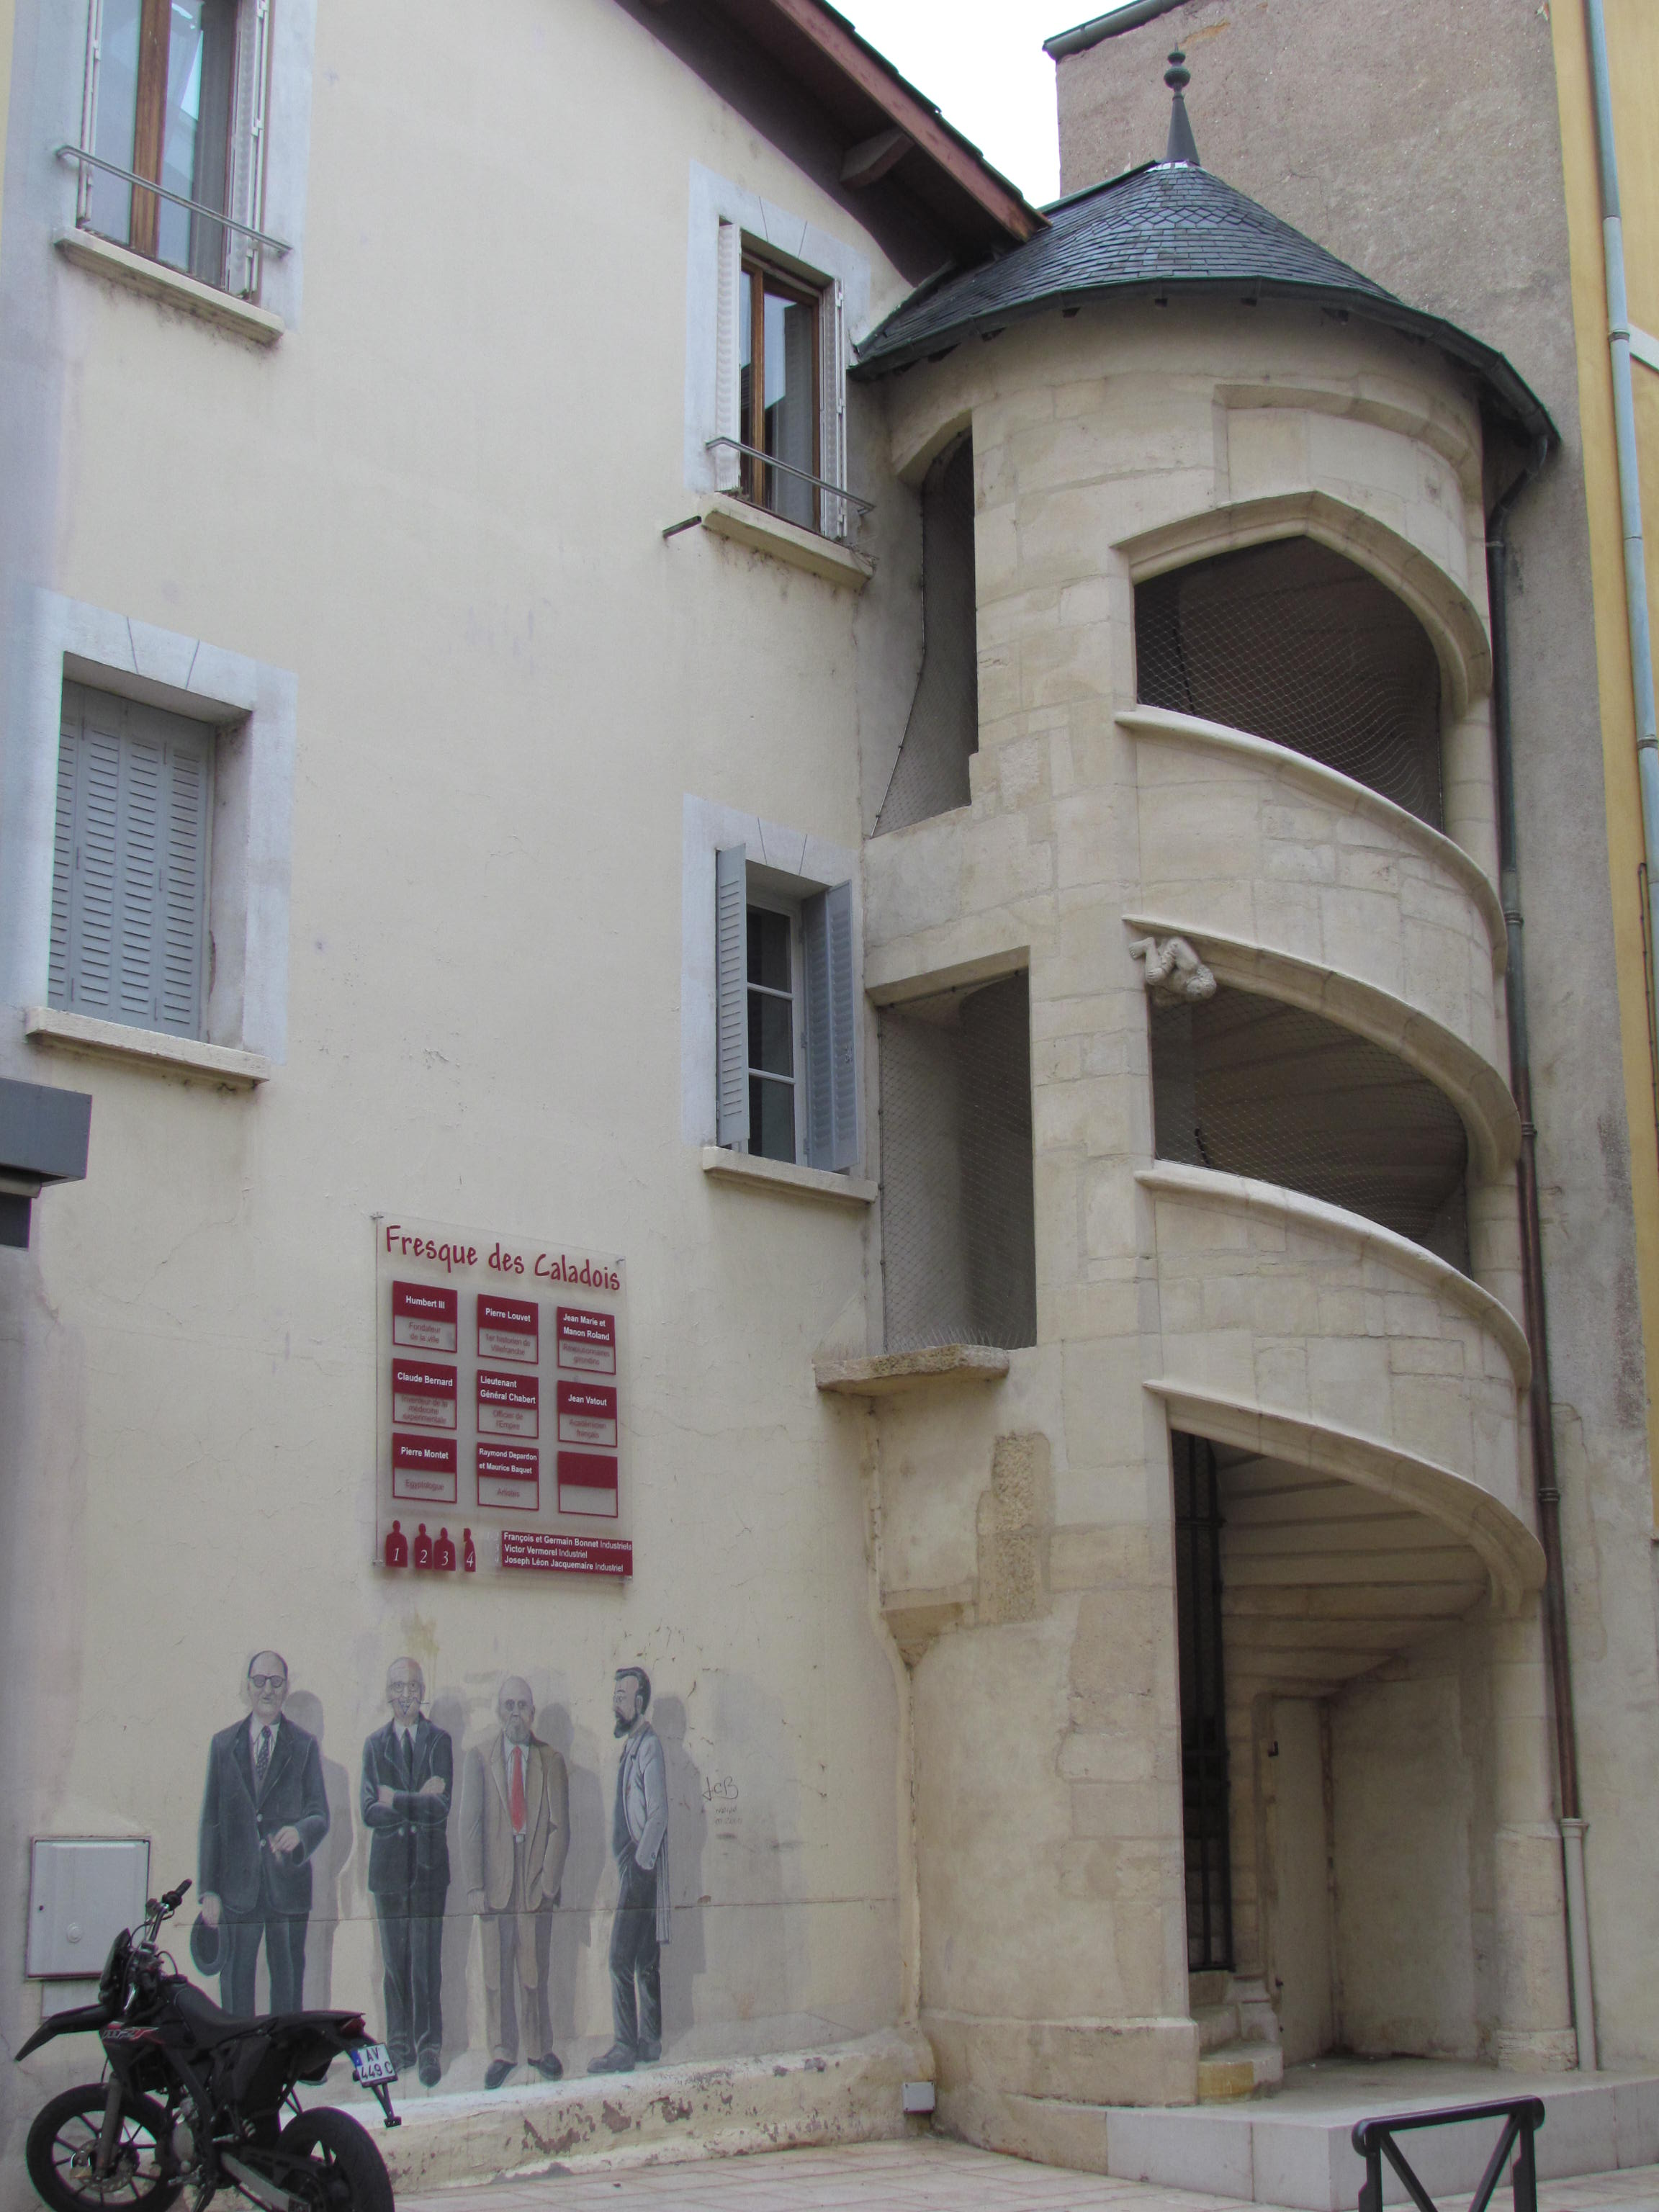 file villefranche sur sa ne escalier maison rue wikimedia commons. Black Bedroom Furniture Sets. Home Design Ideas